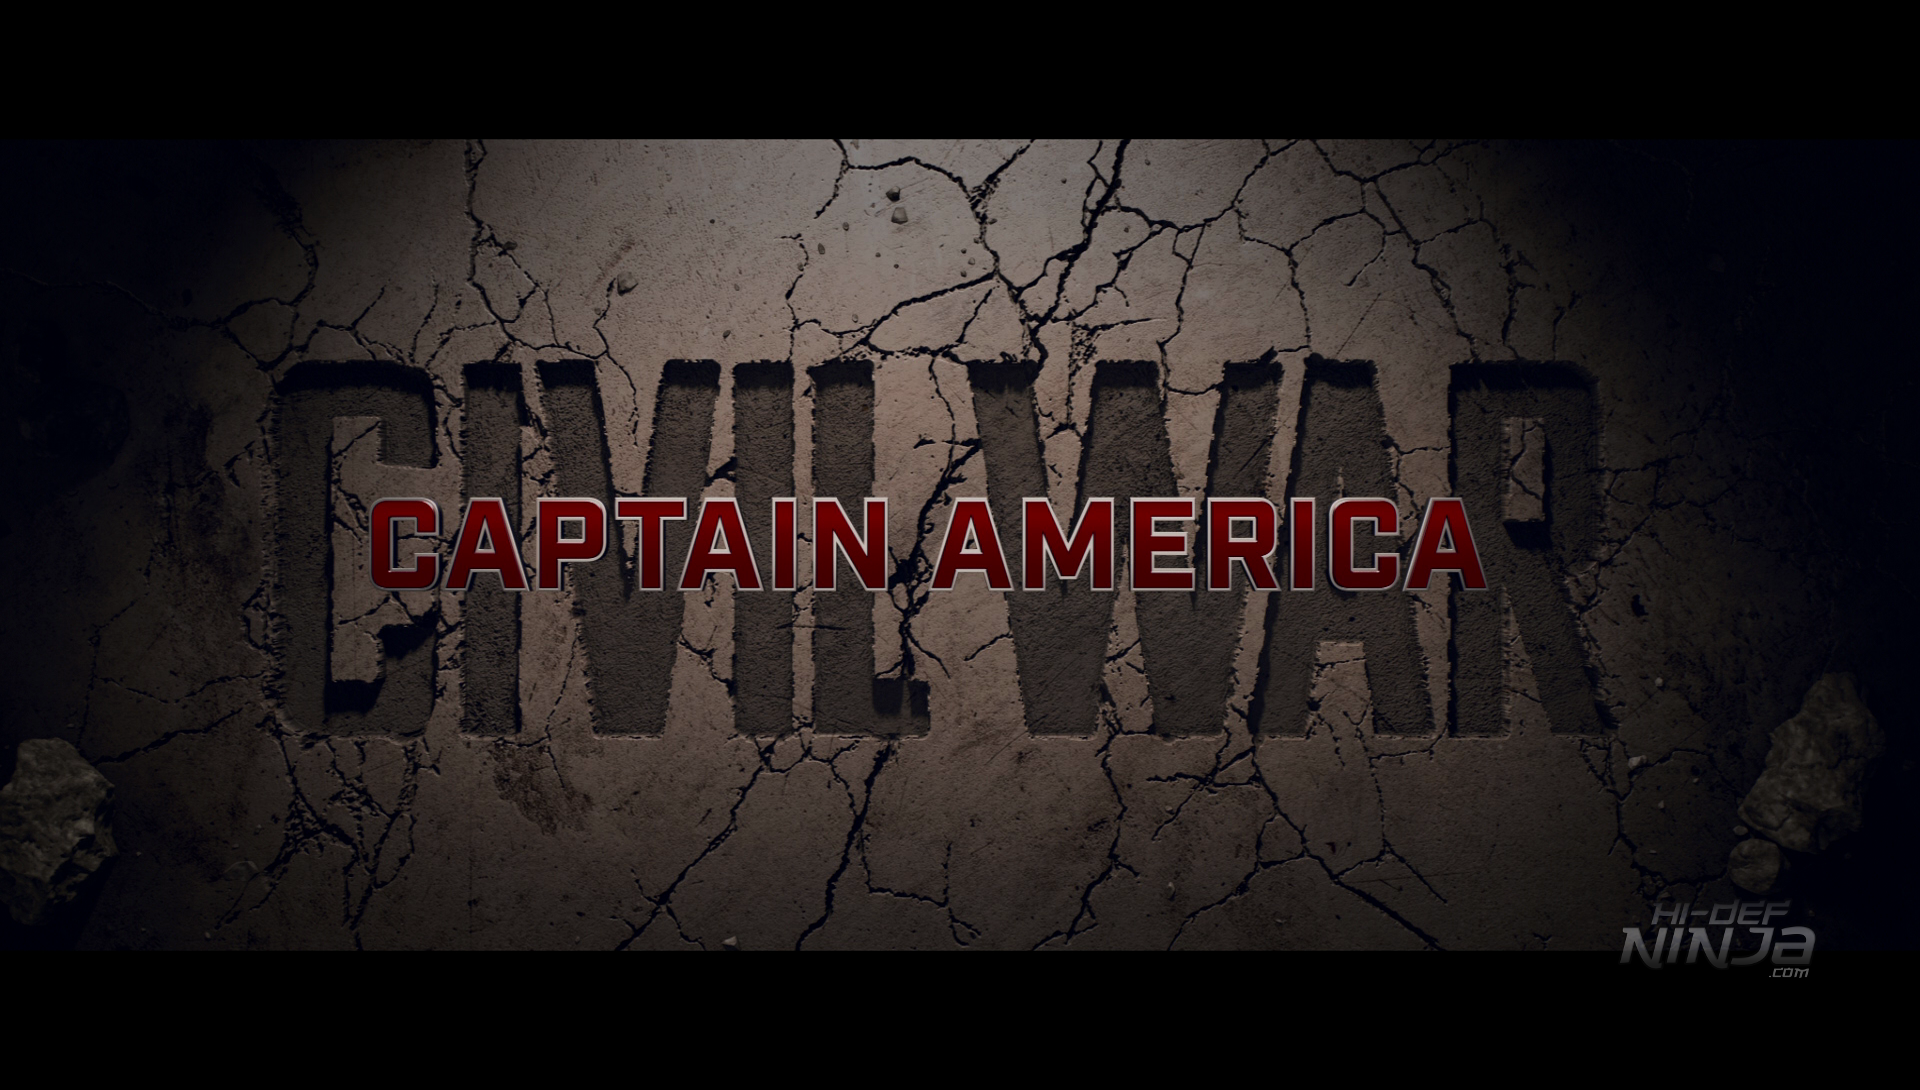 captainamericacivilwar-hidefninja-1